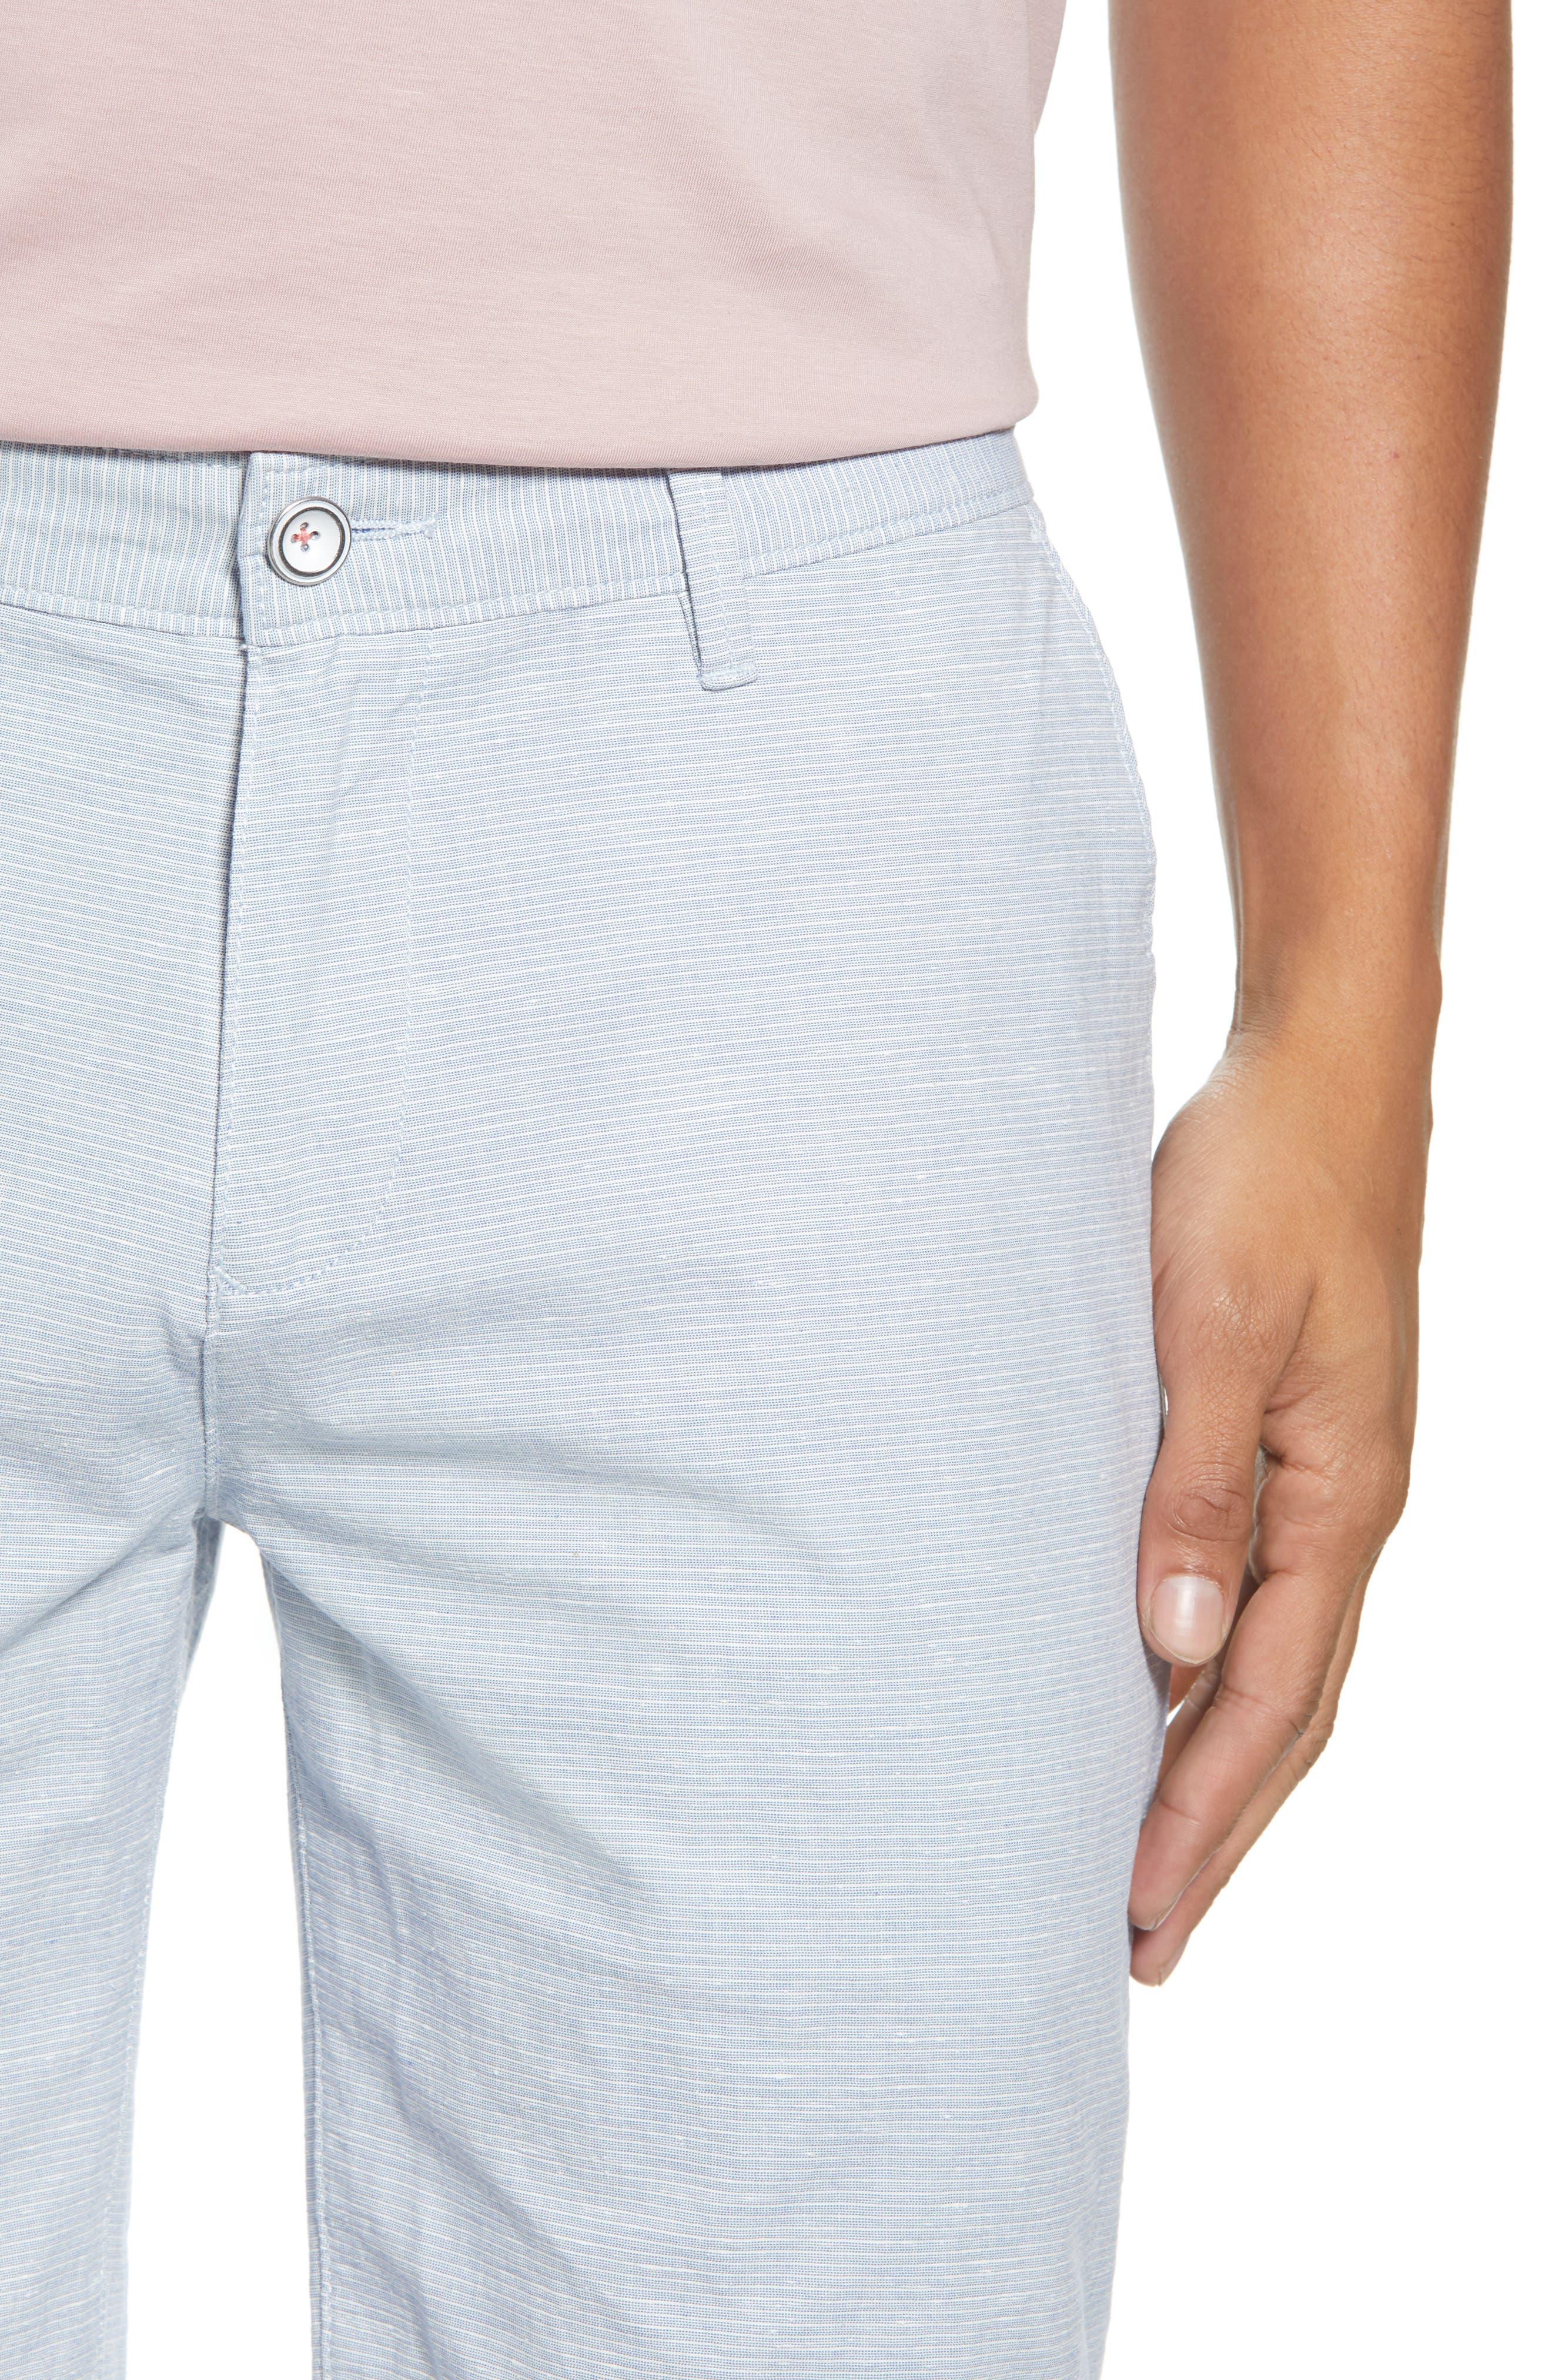 Stoke Valley Shorts,                             Alternate thumbnail 4, color,                             SKY